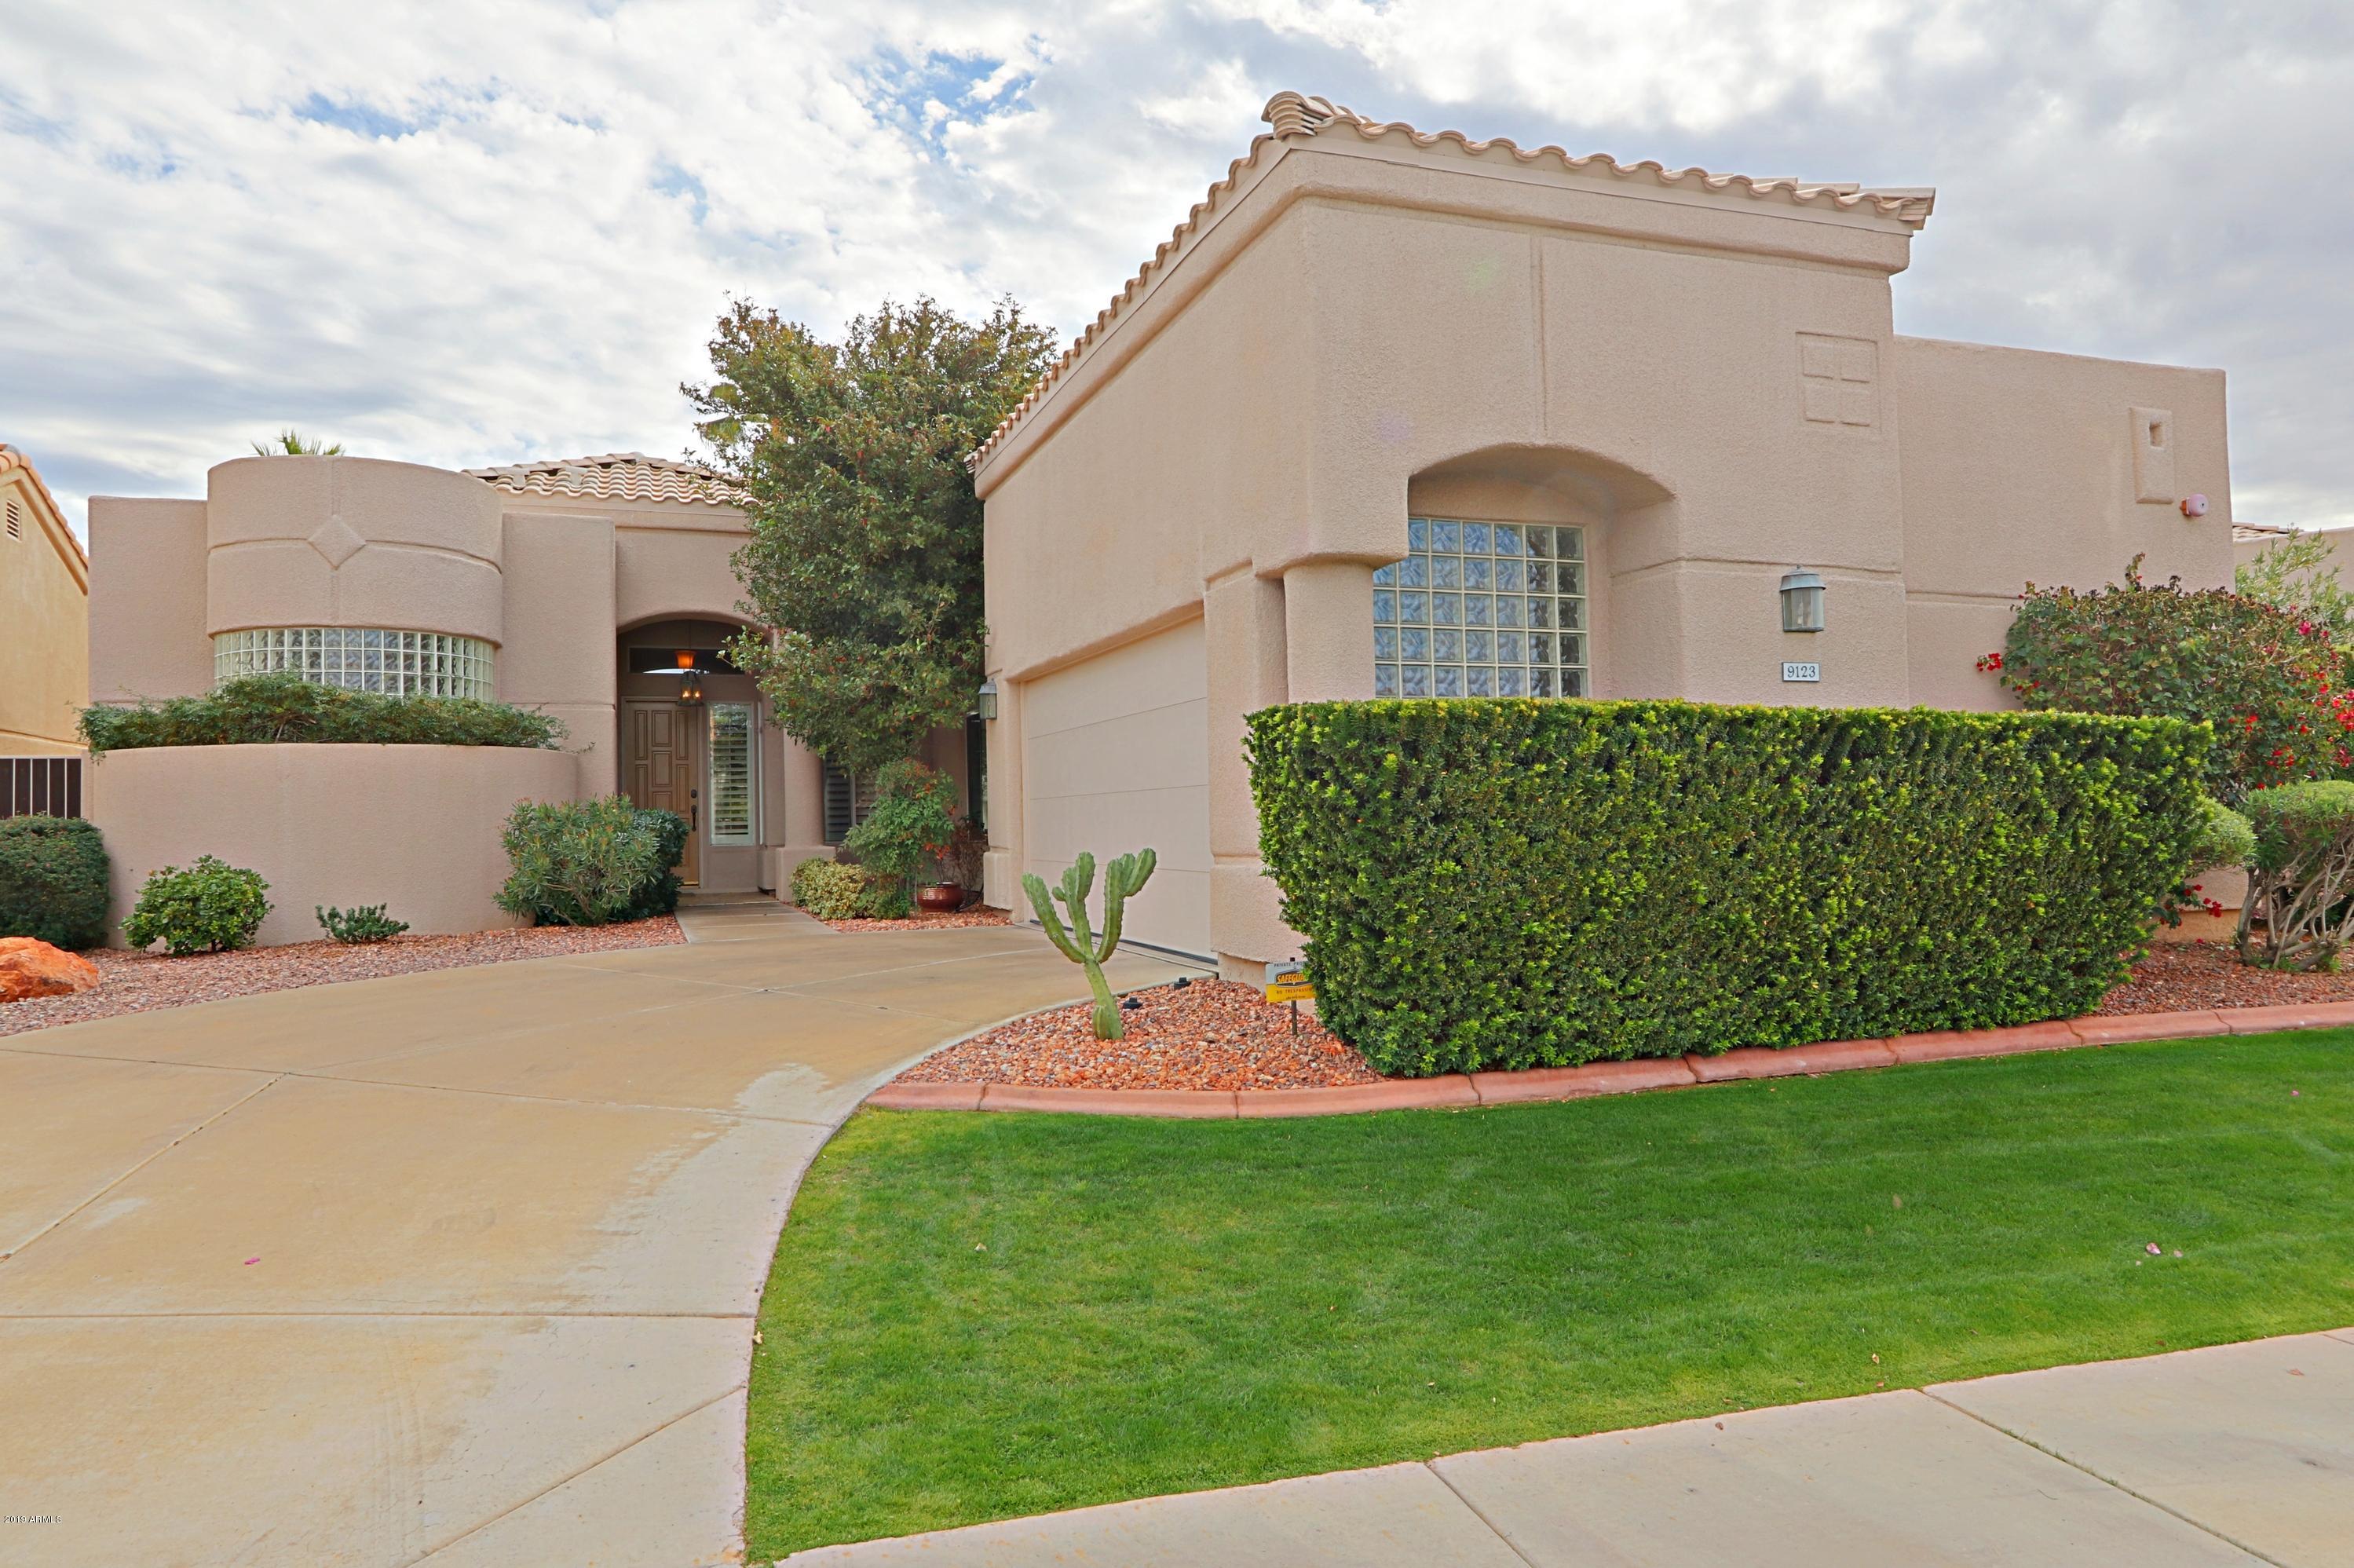 Photo of 9123 N 115TH Place, Scottsdale, AZ 85259